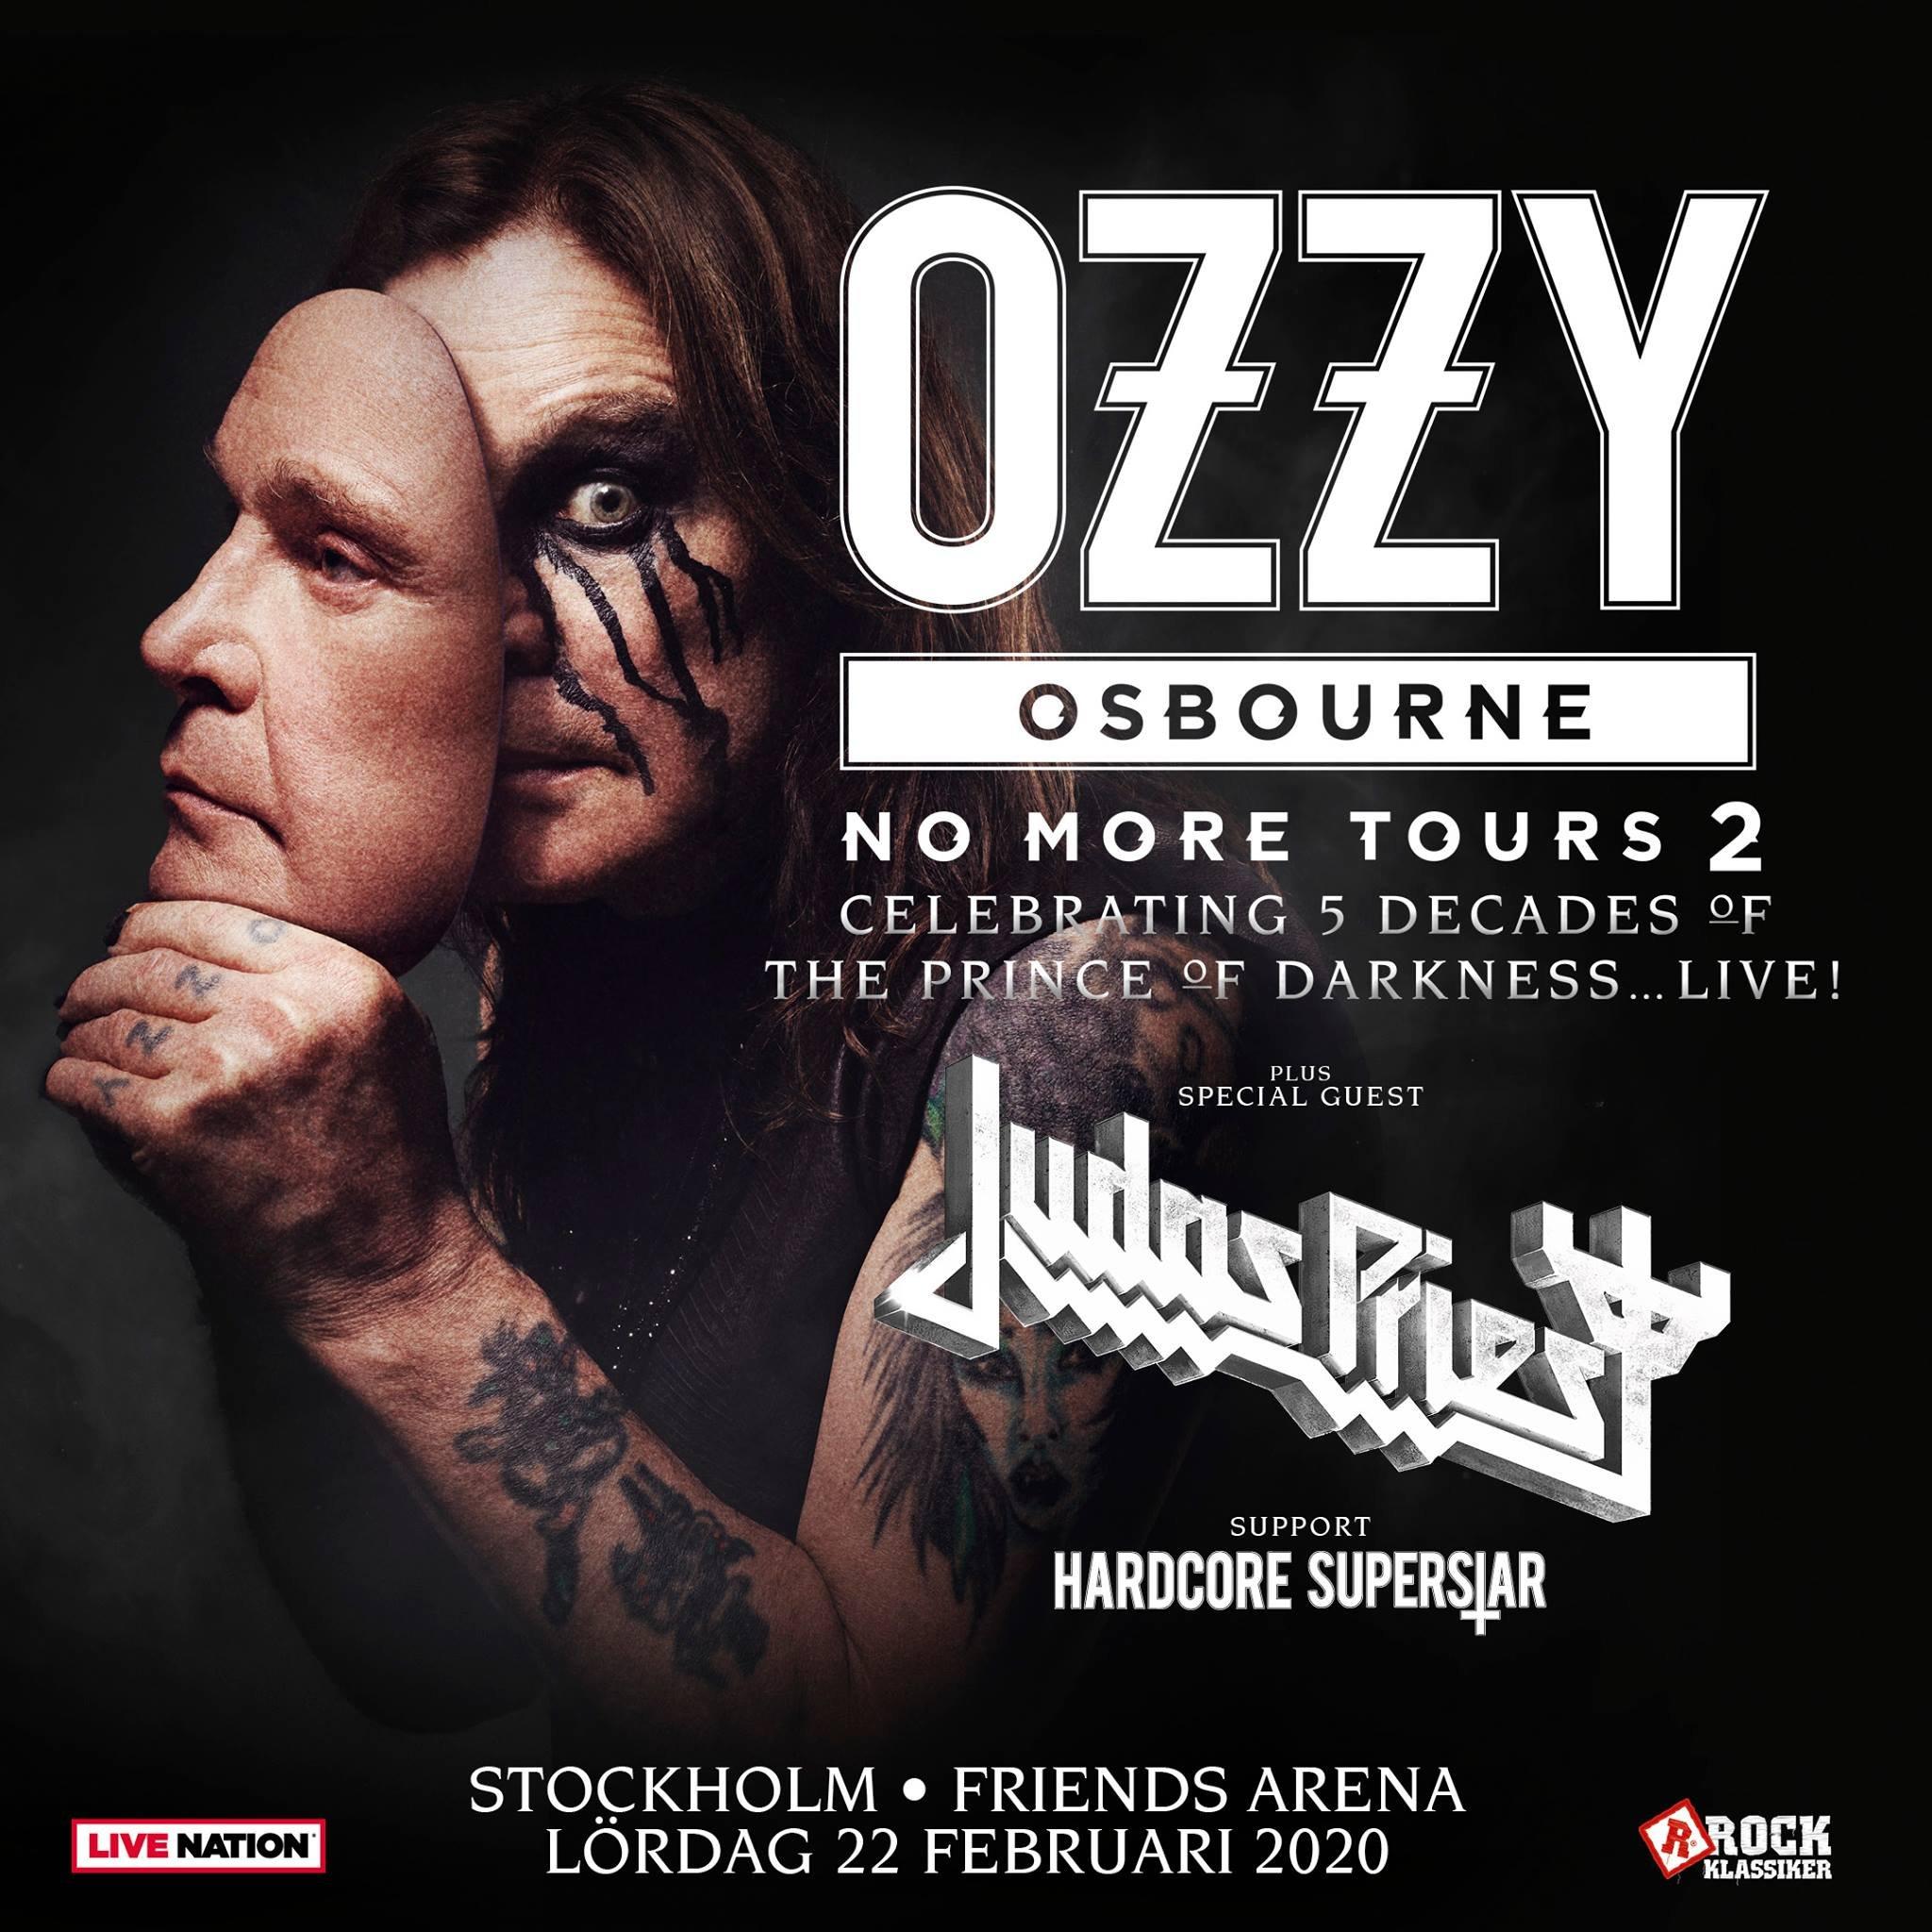 ozzy osbourne canceled shows 2020